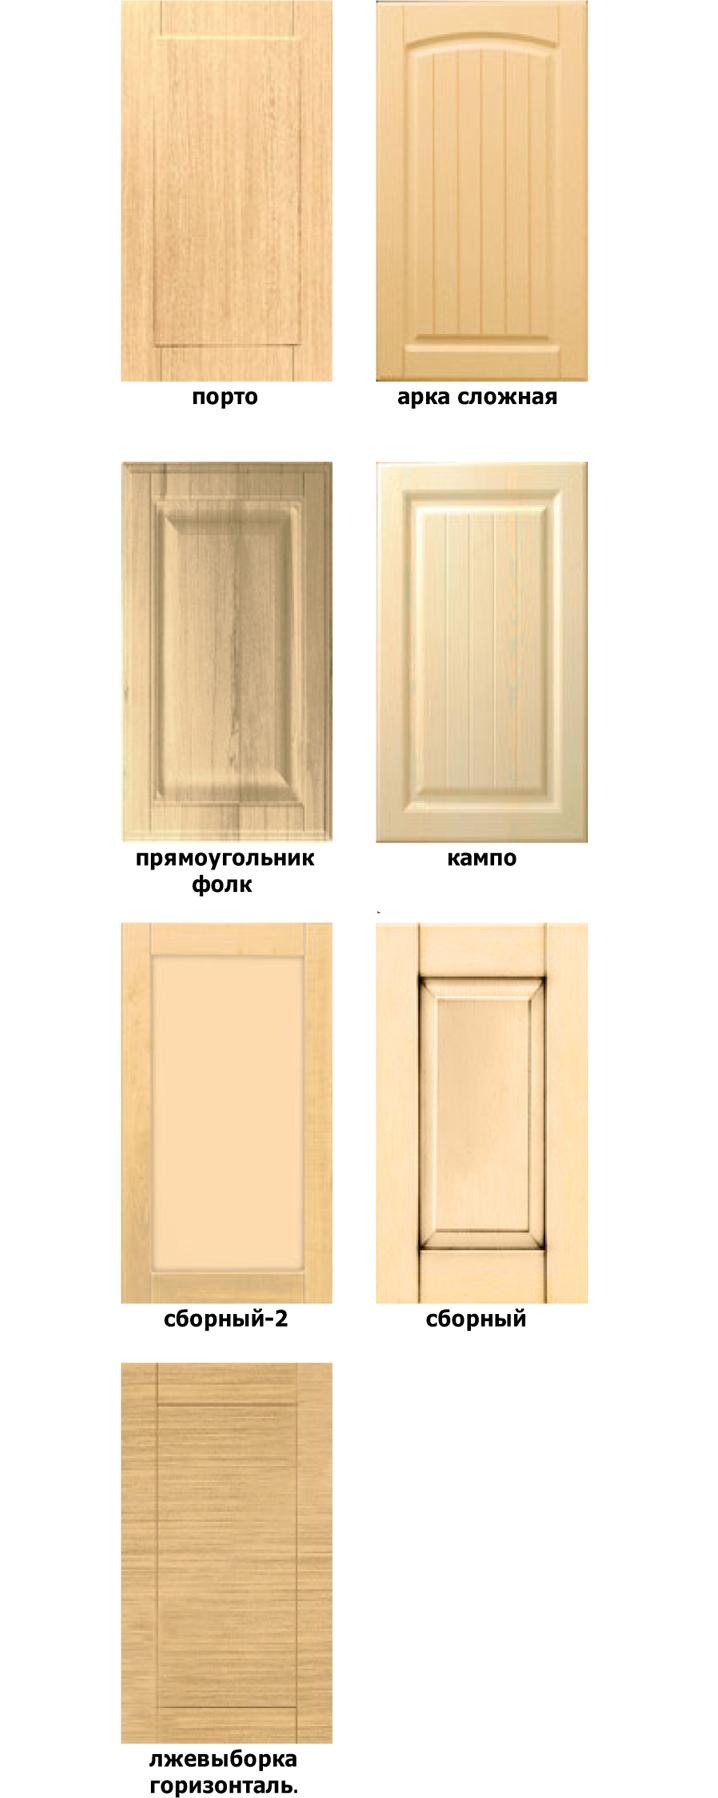 кантри окантовки для дверей МДФ